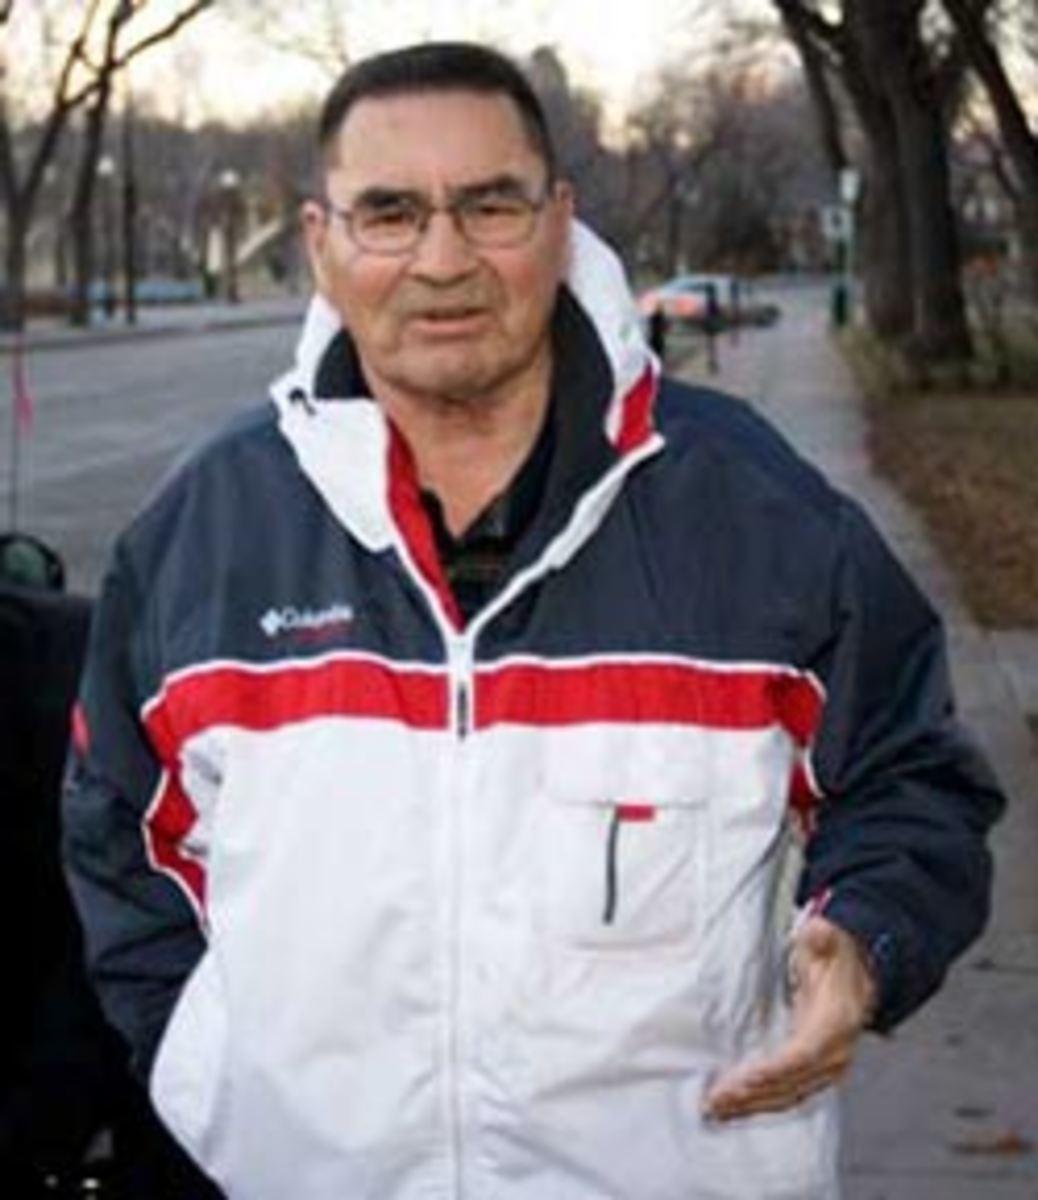 David Ahenakew (July 28, 1933  March 12, 2010) - cancer deaths